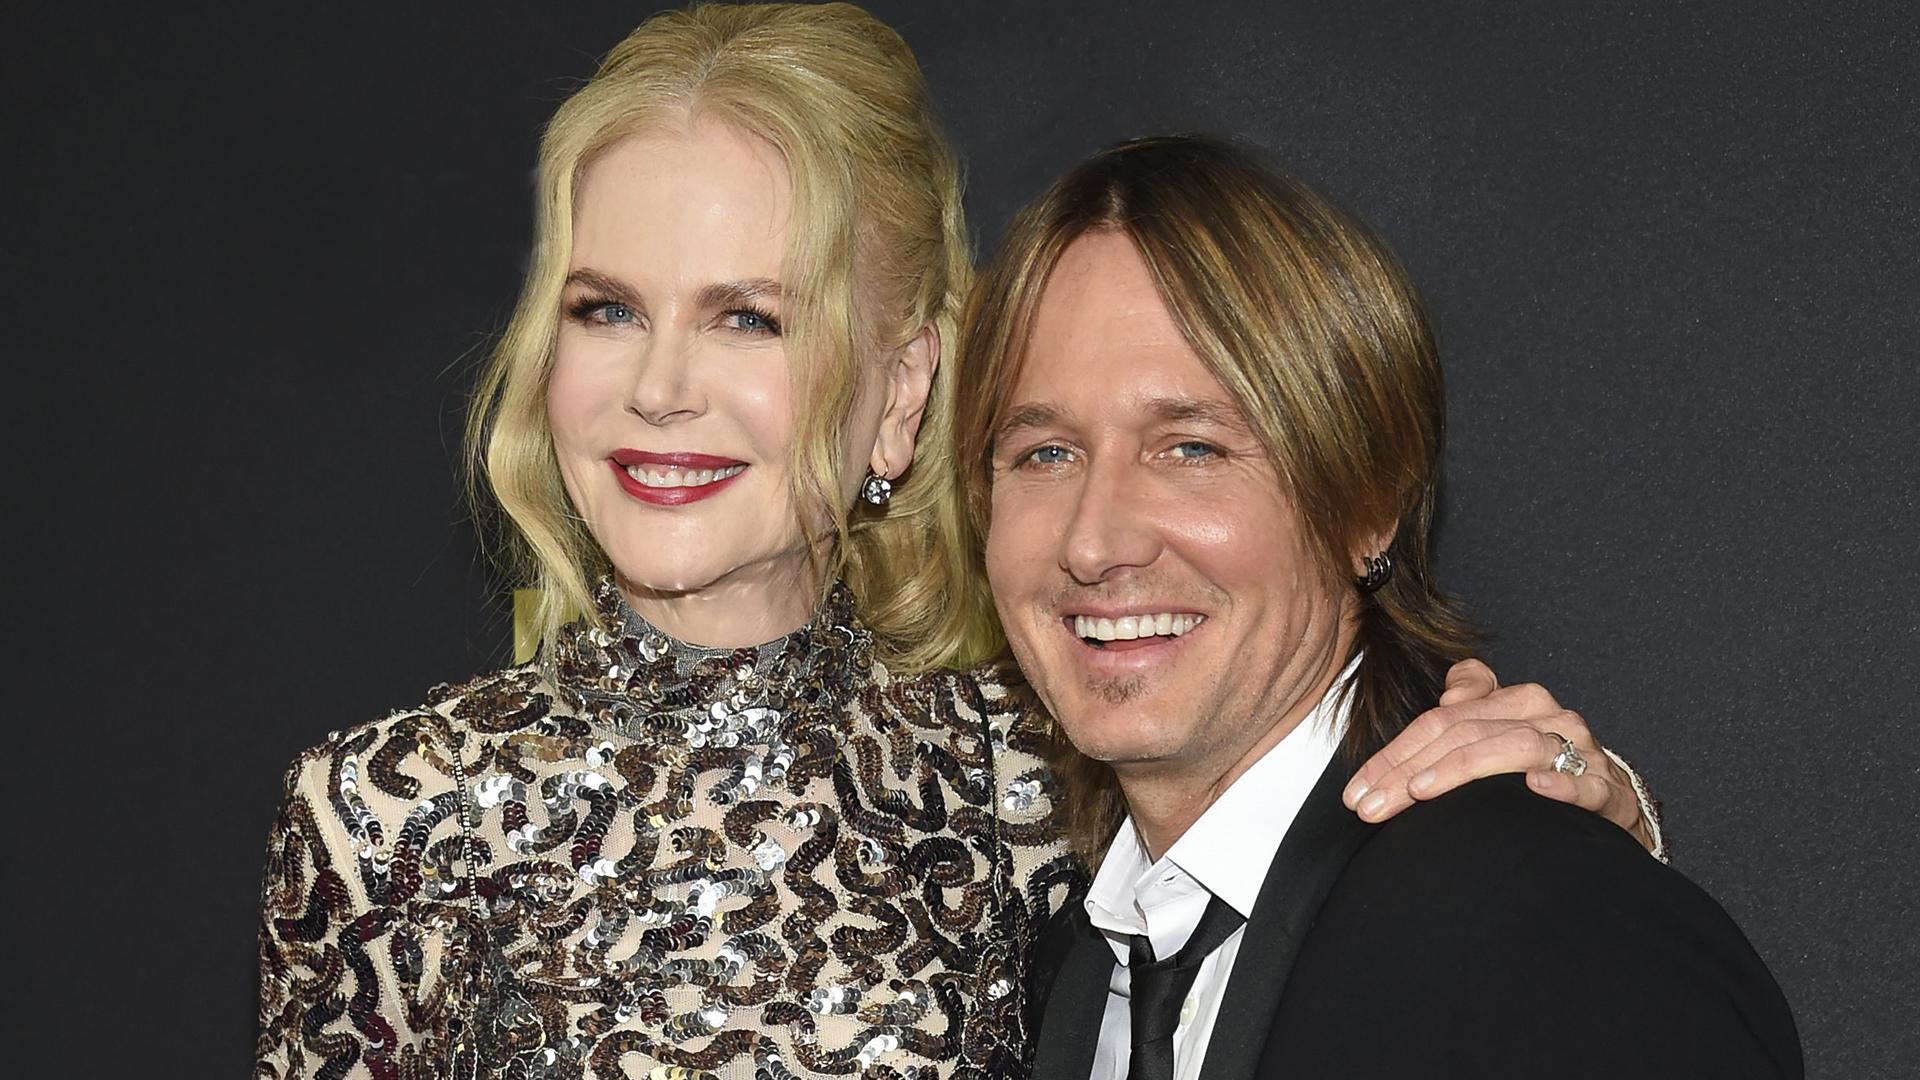 Nicole Kidman From Keith Urban: Nicole Kidman Shares Surprising Secret To Long Marriage